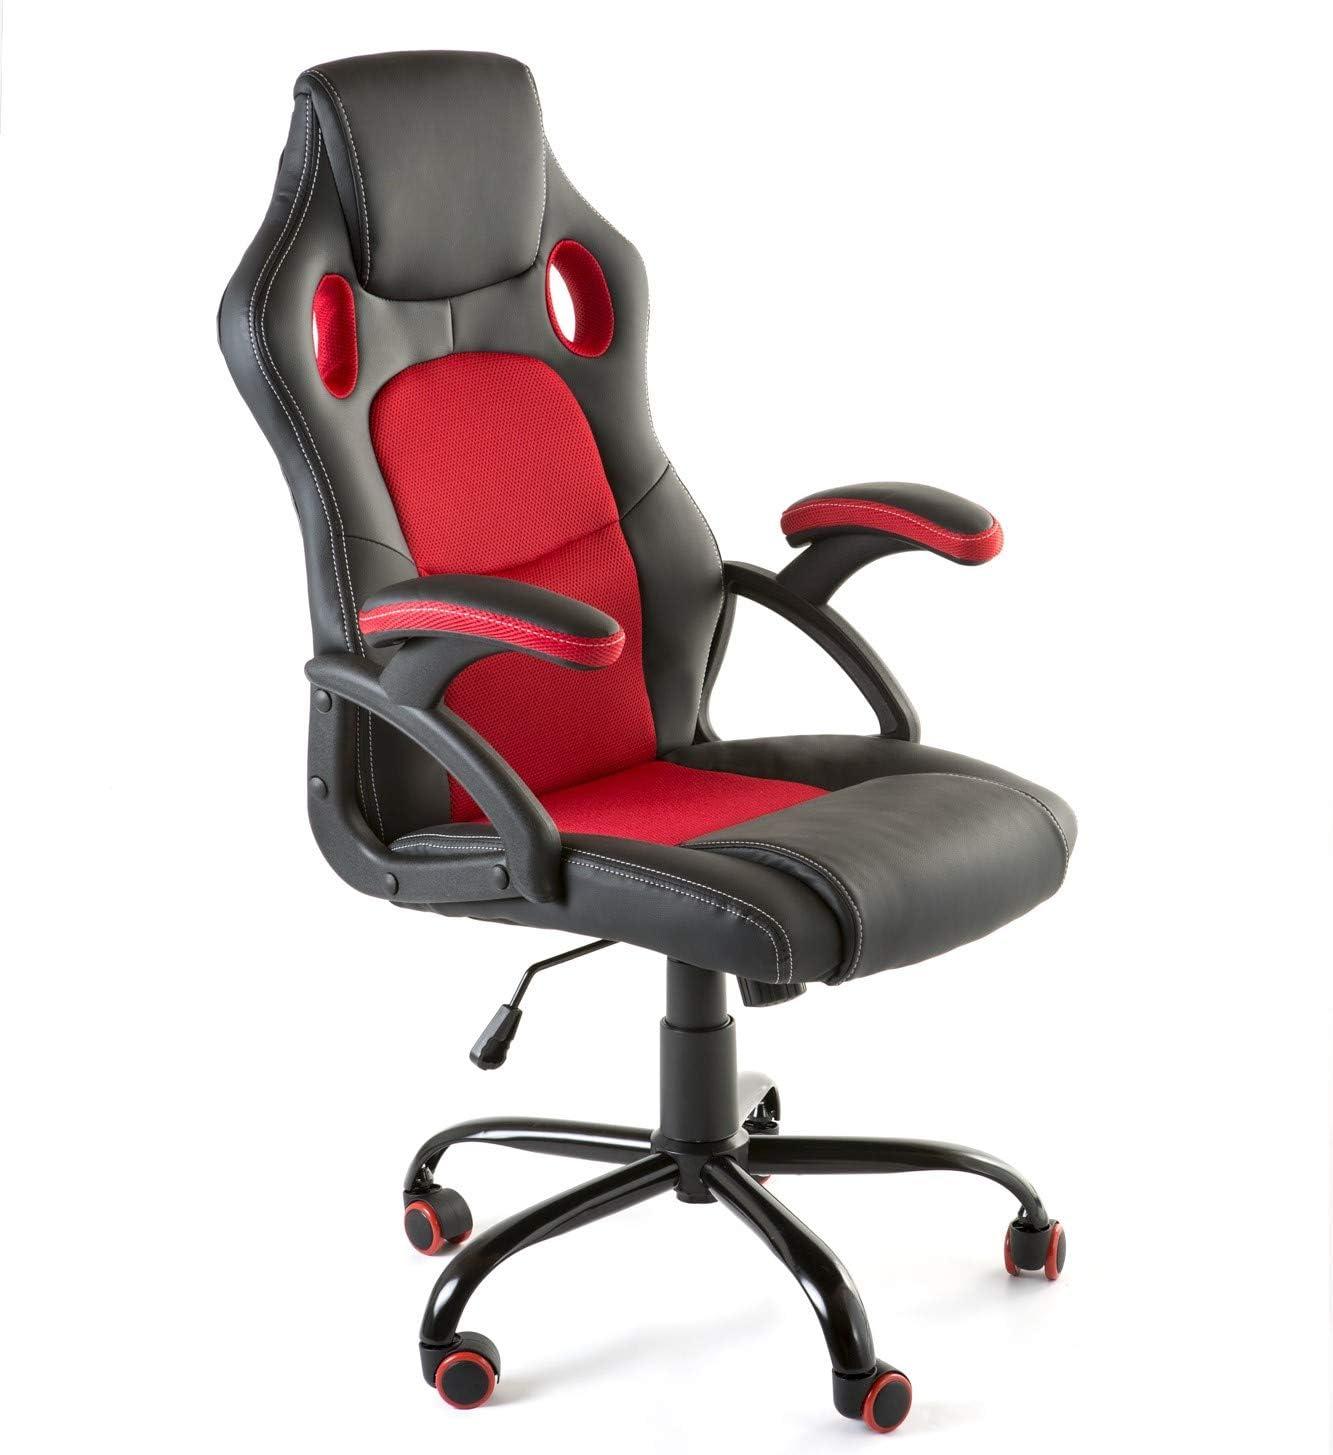 Home Heavenly®- Silla X-Gamer, de Oficina, sillón Gaming ergonómico, diseño de Oficina y despacho, Escritorio, con Ruedas (Rojo)